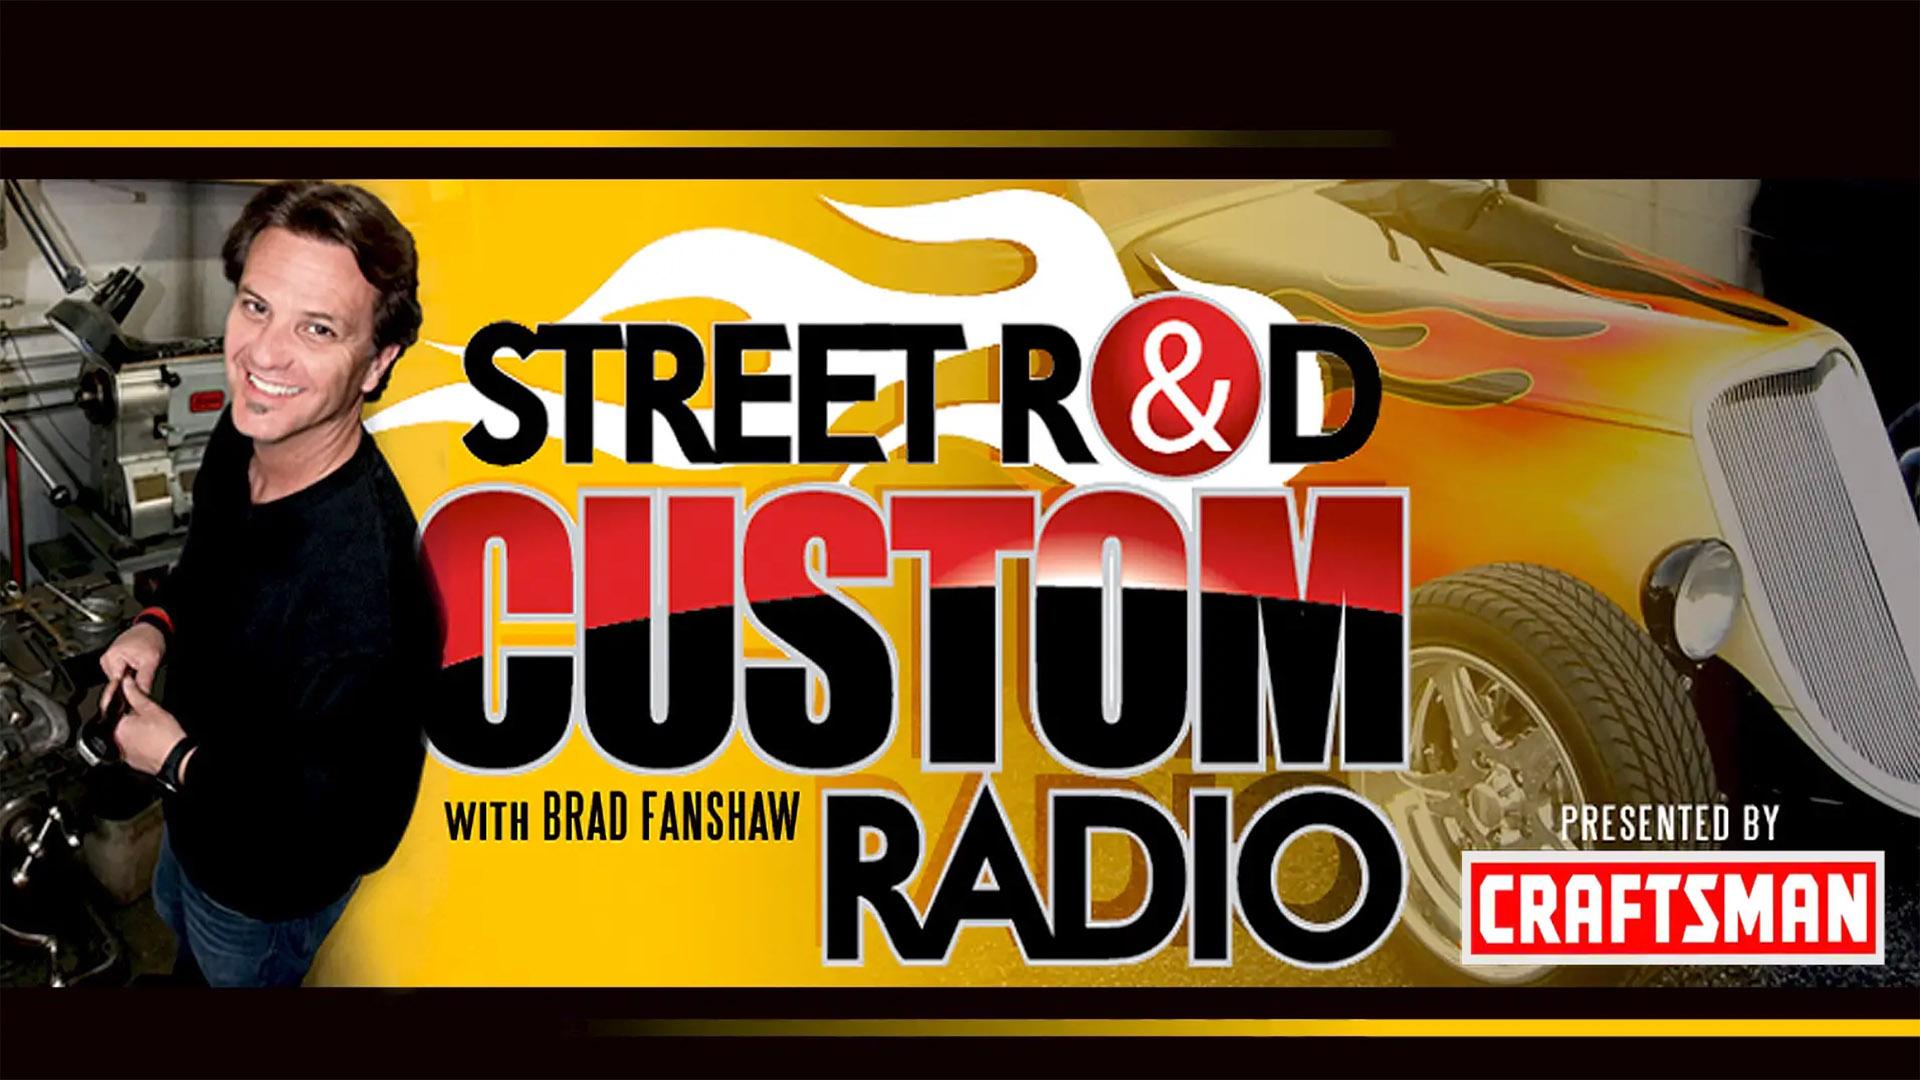 Street Rod and Custom Radio video. Omaha Video Production Company LP Photo Video.